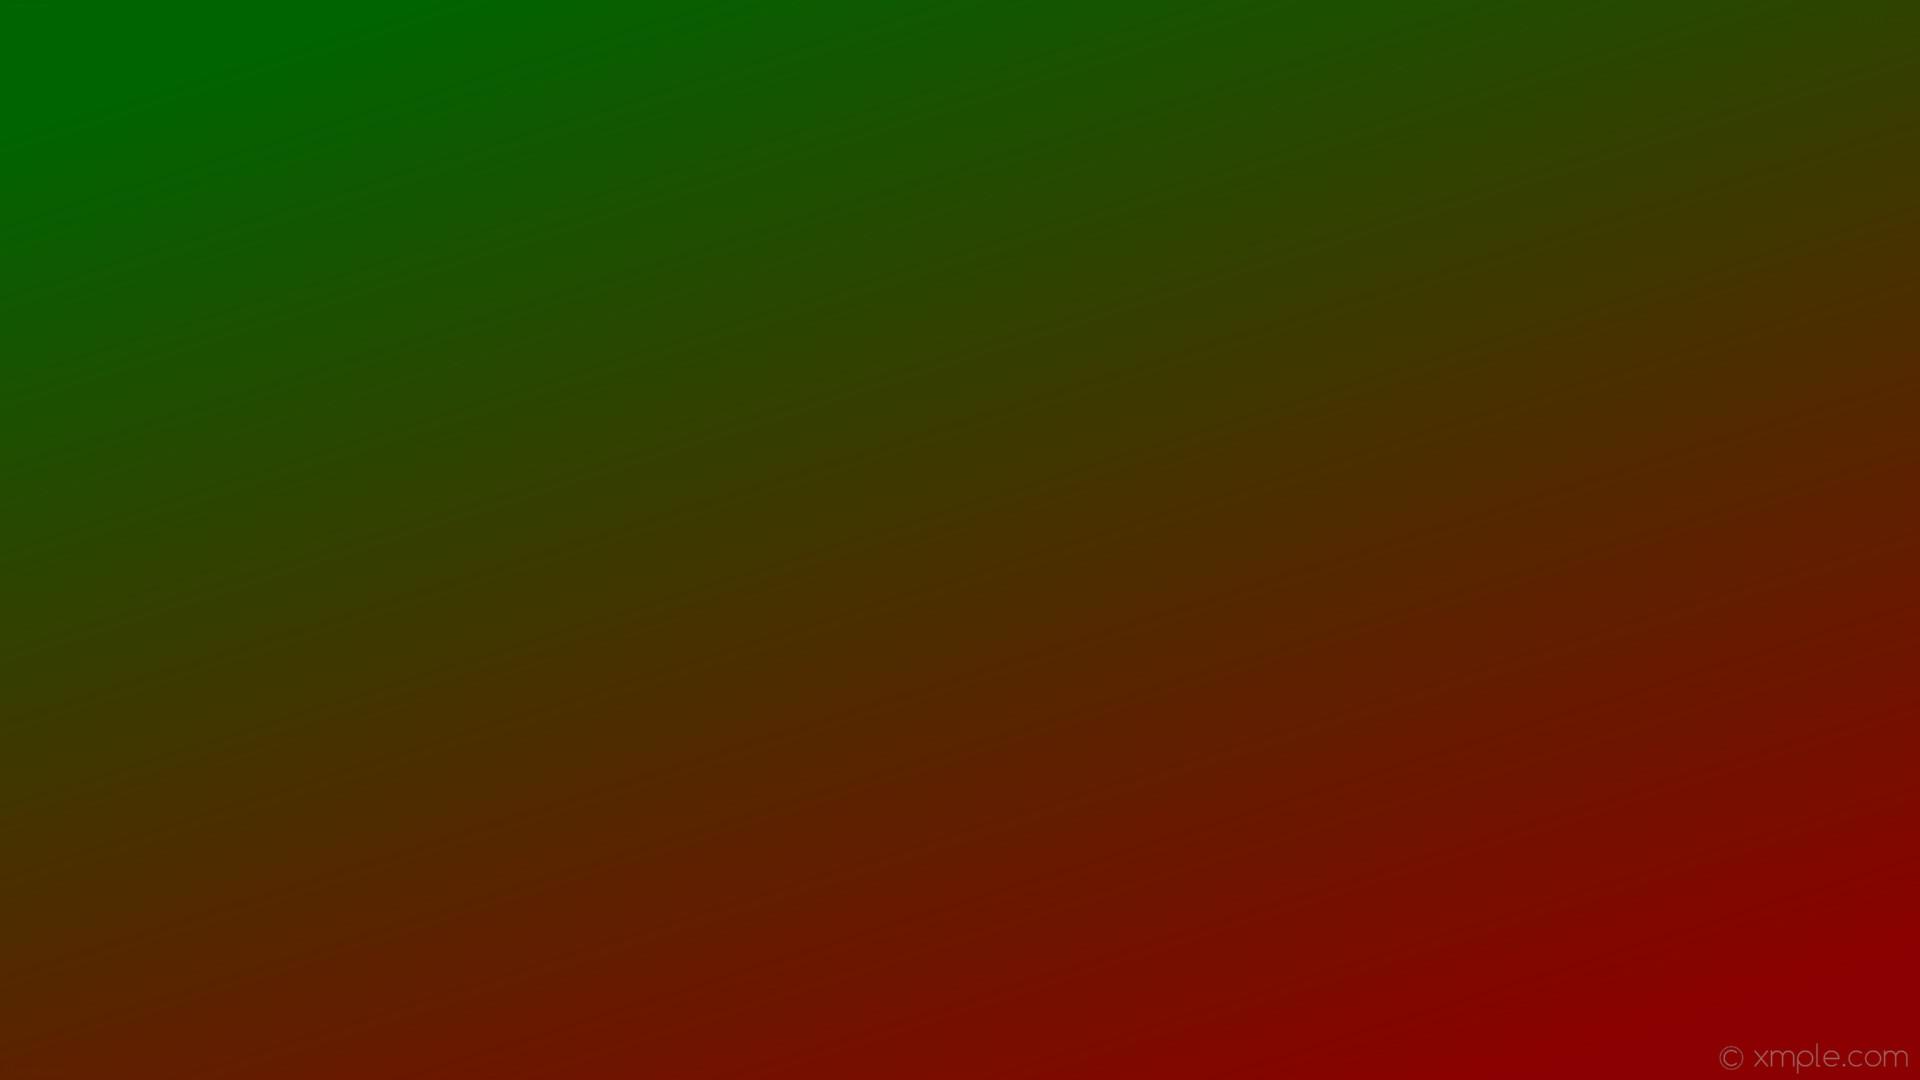 wallpaper gradient linear green red dark green dark red #006400 #8b0000 135°